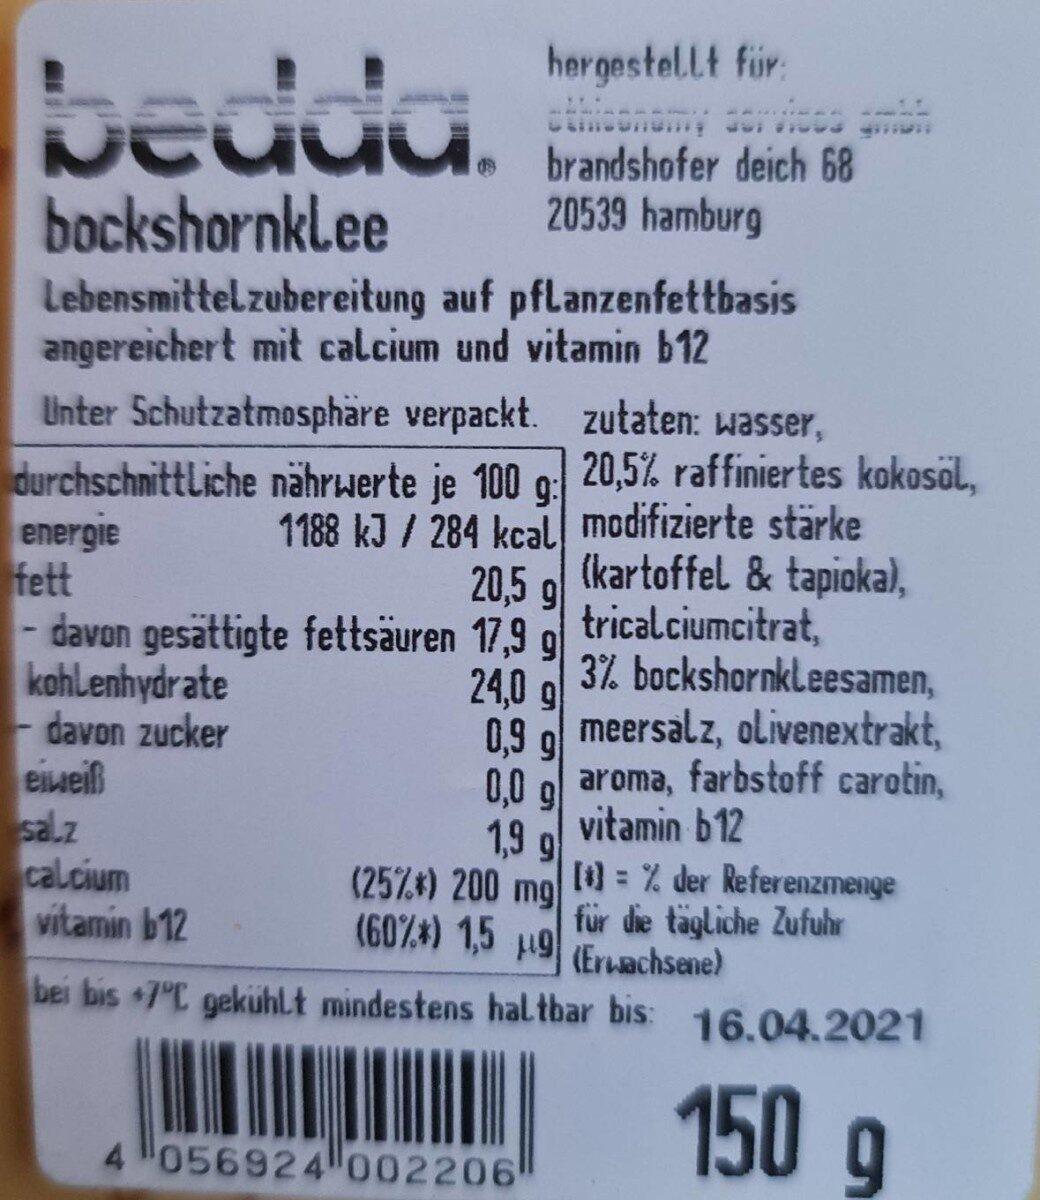 Bedda scheiben bockshornklee - Valori nutrizionali - de